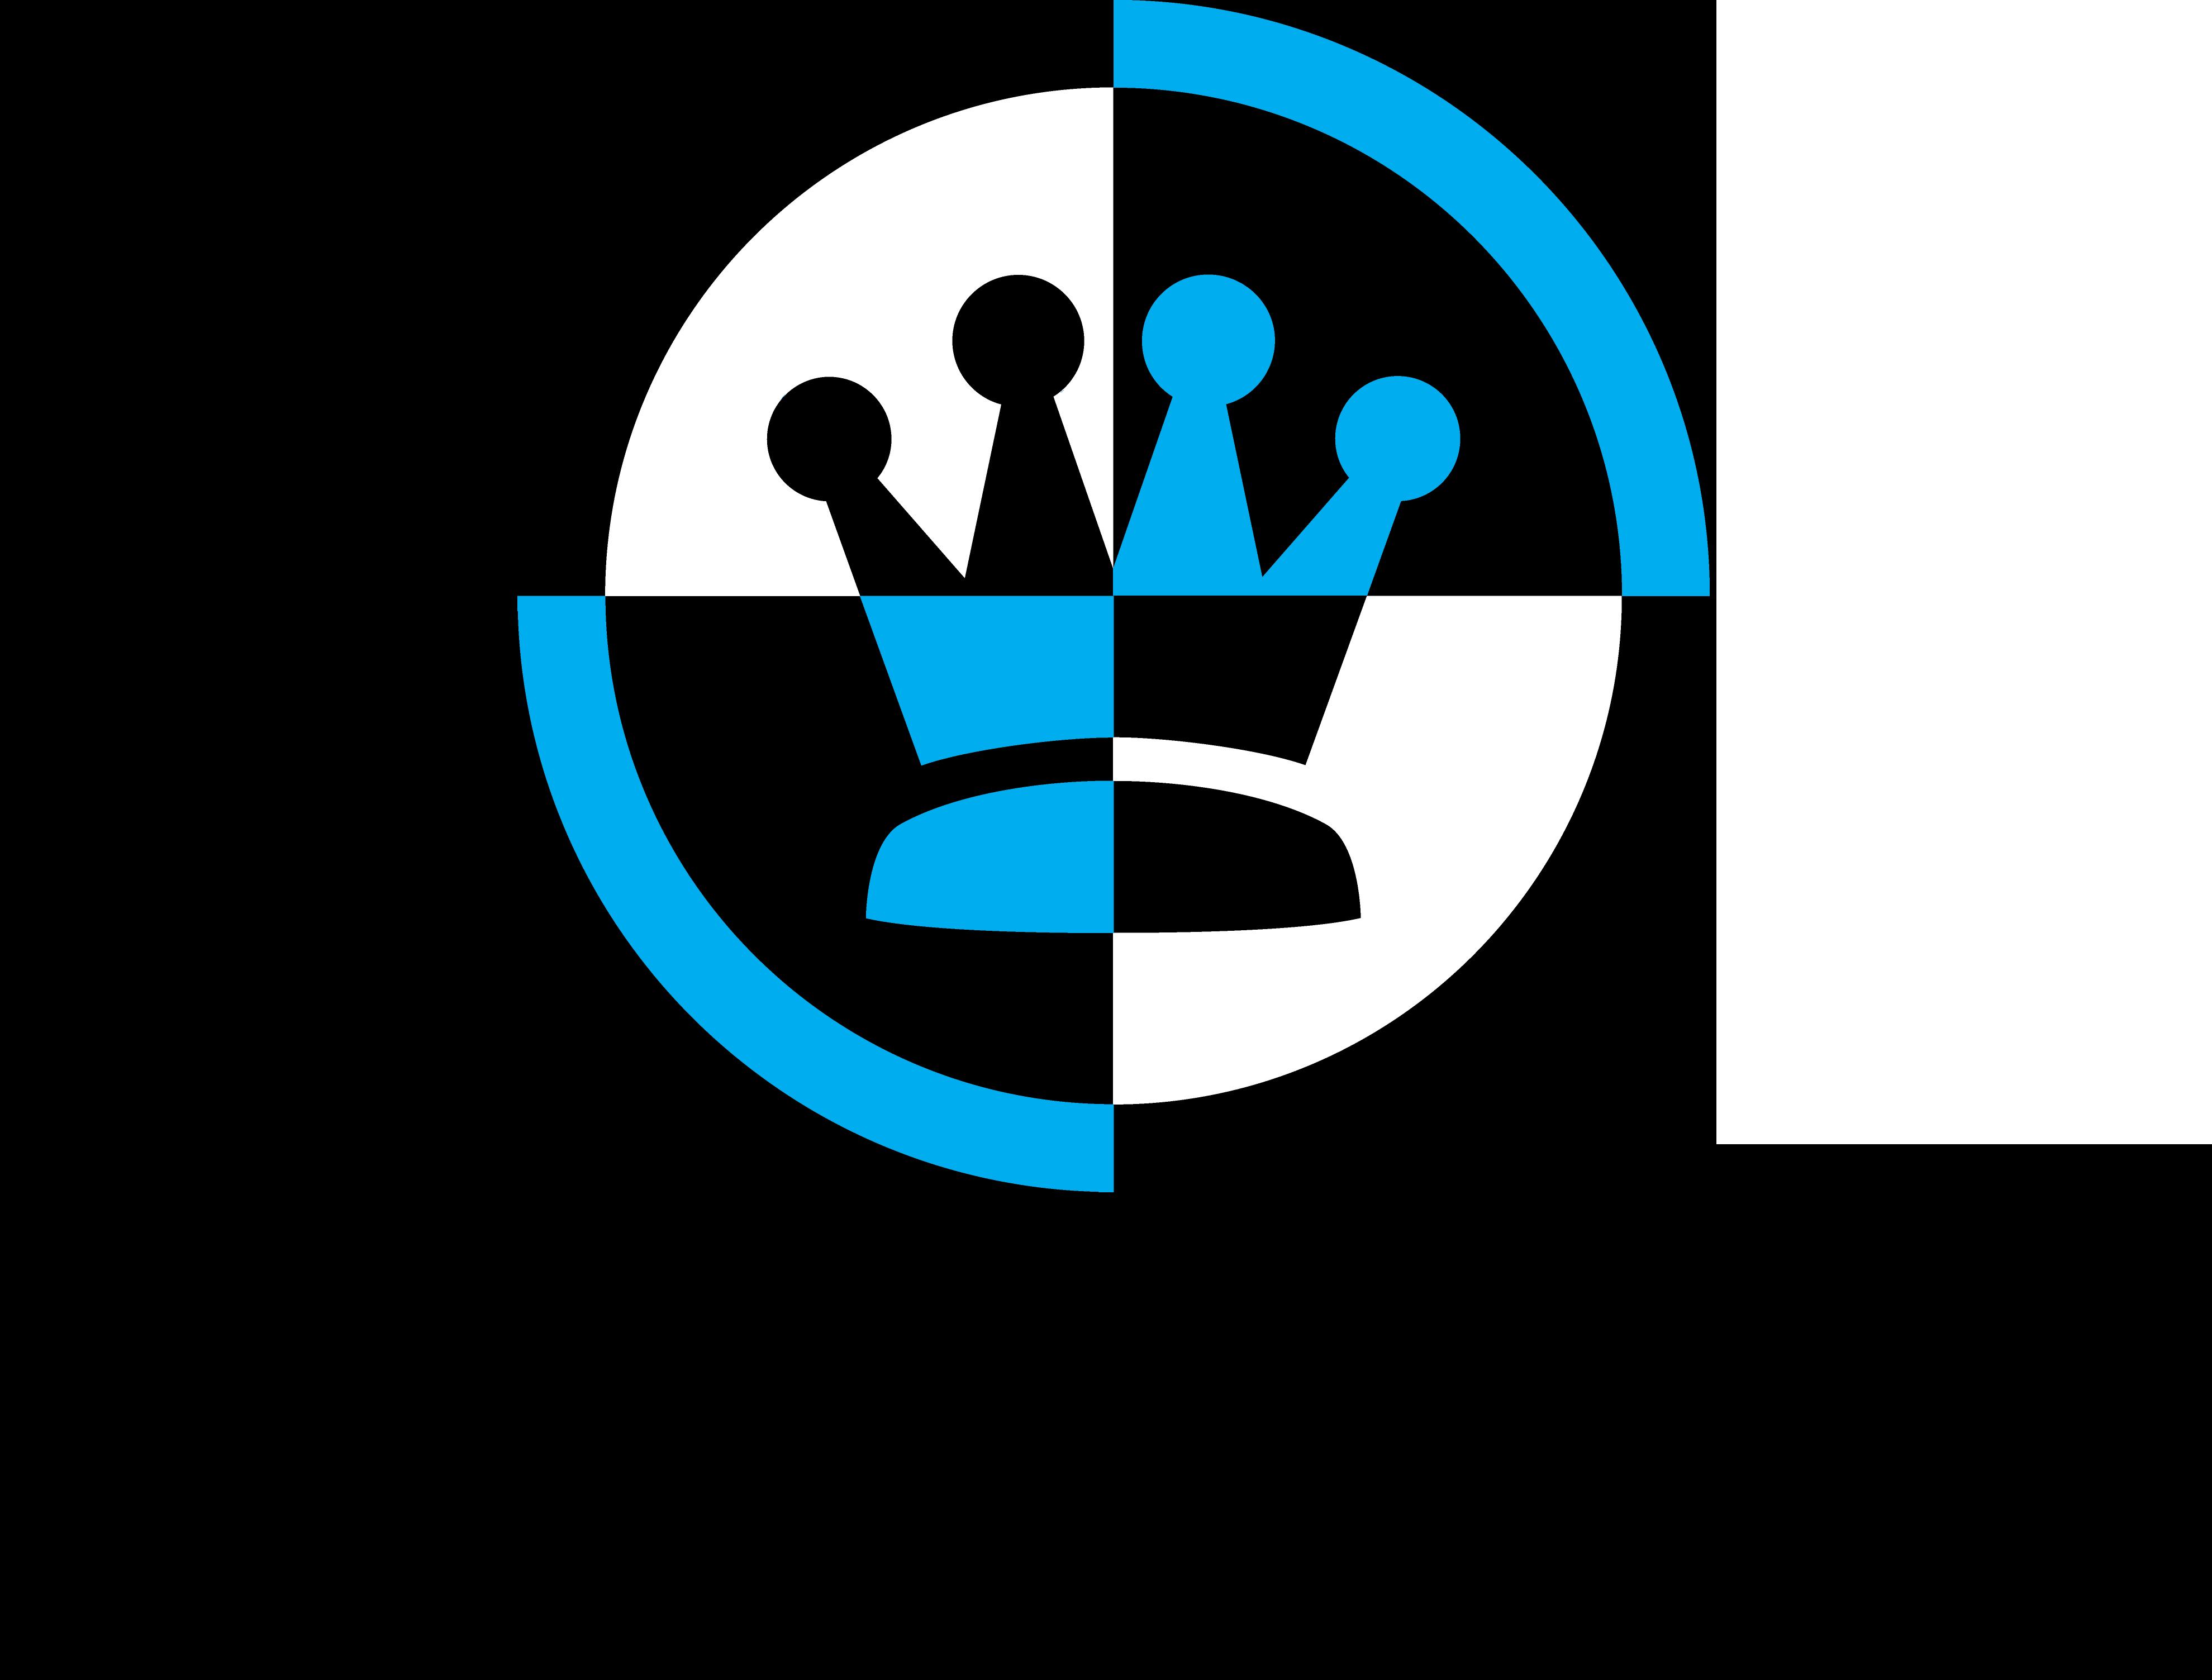 logo-normal 09 07 2